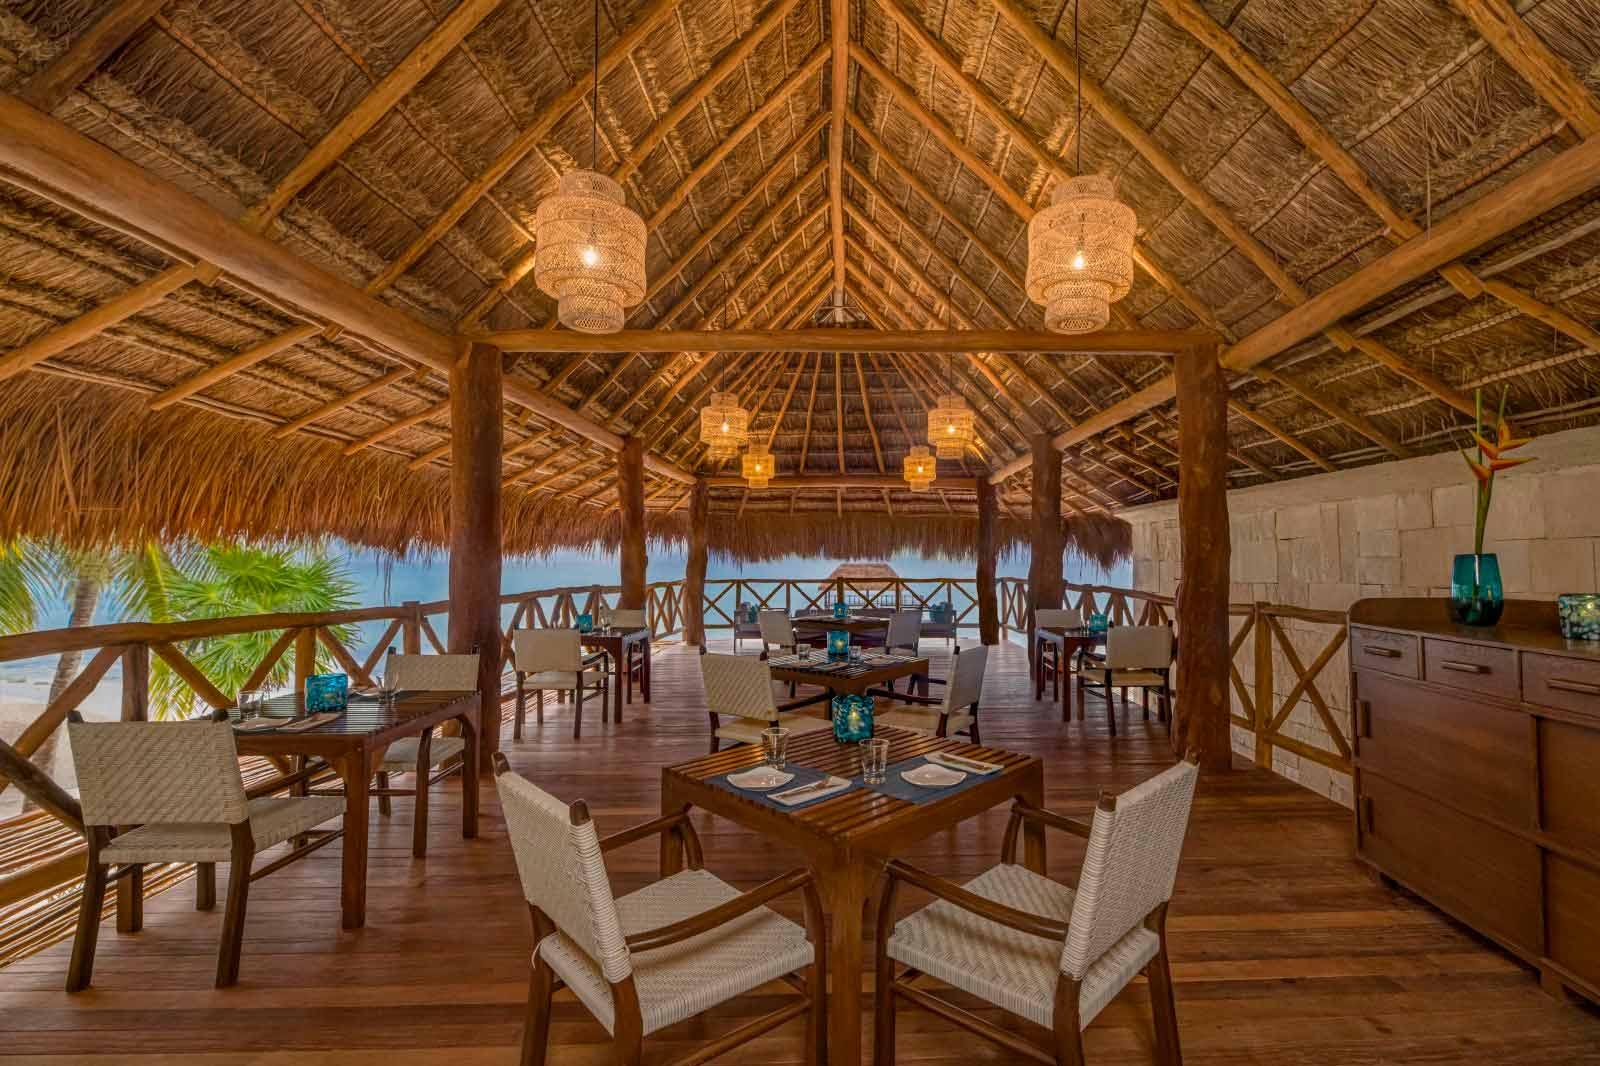 mexicofinder-travel-riviera-maya-hotel-viceroy-restaurant